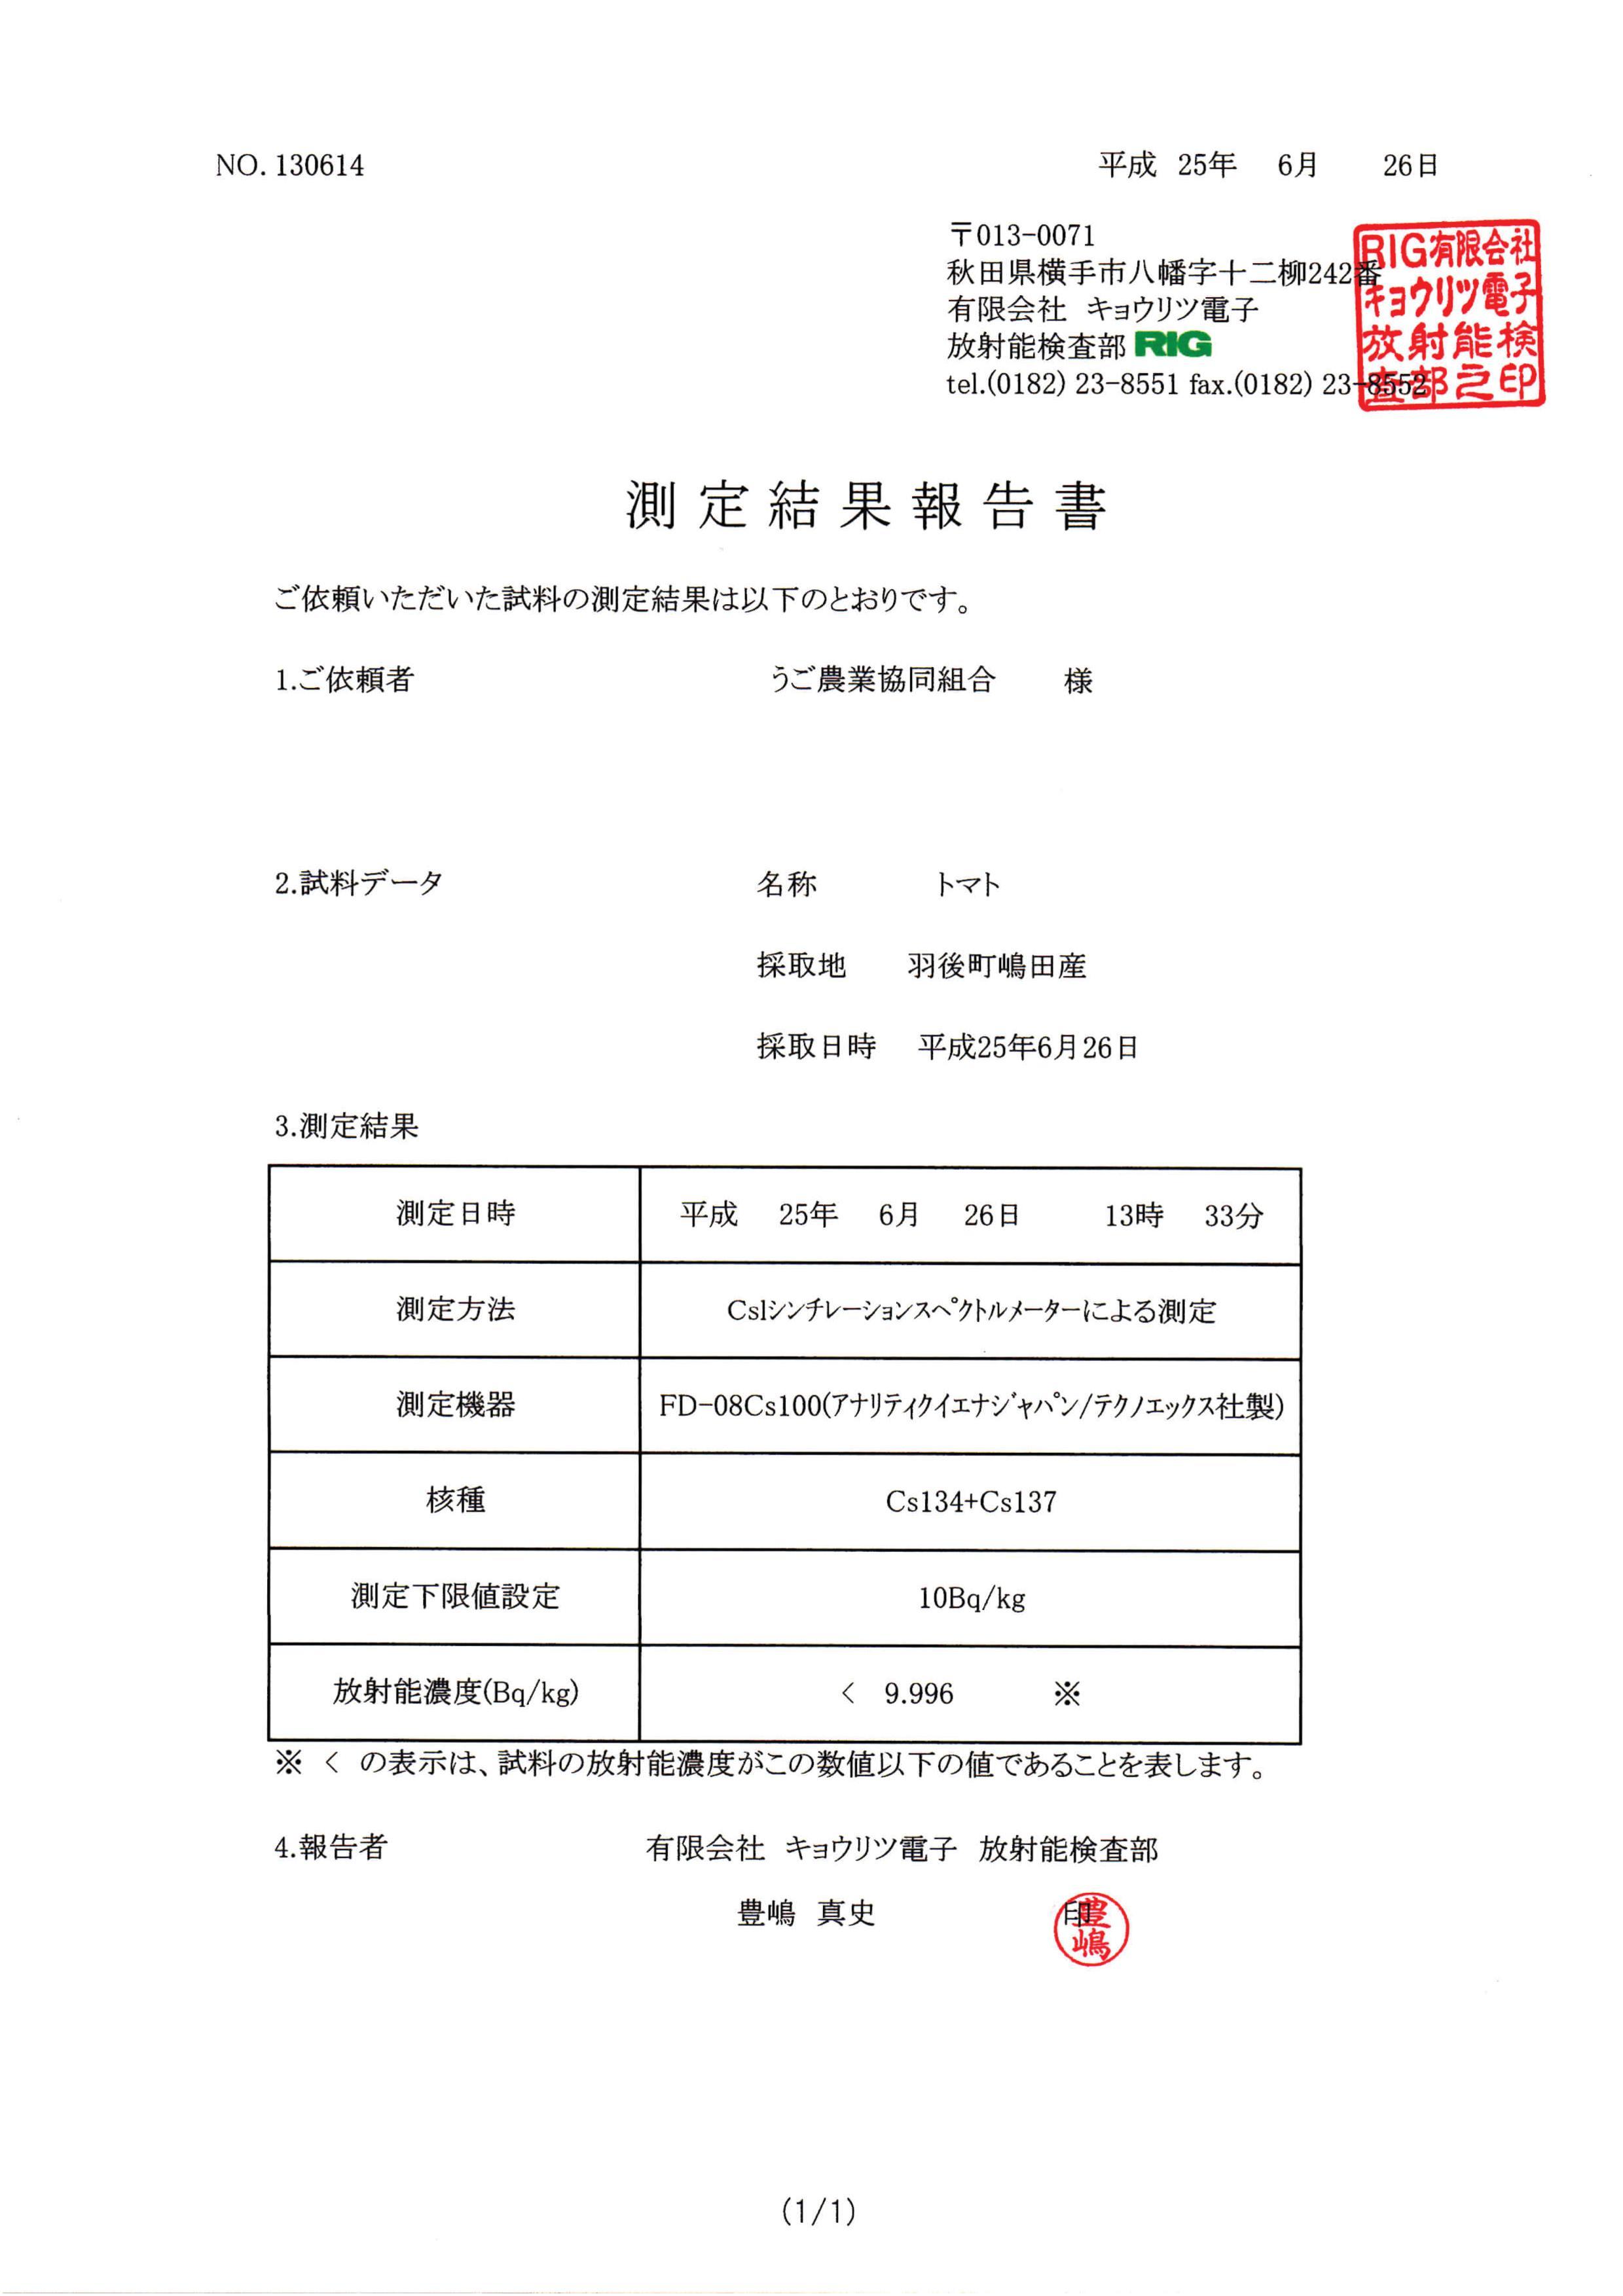 6月26日トマト測定結果報告書.jpg